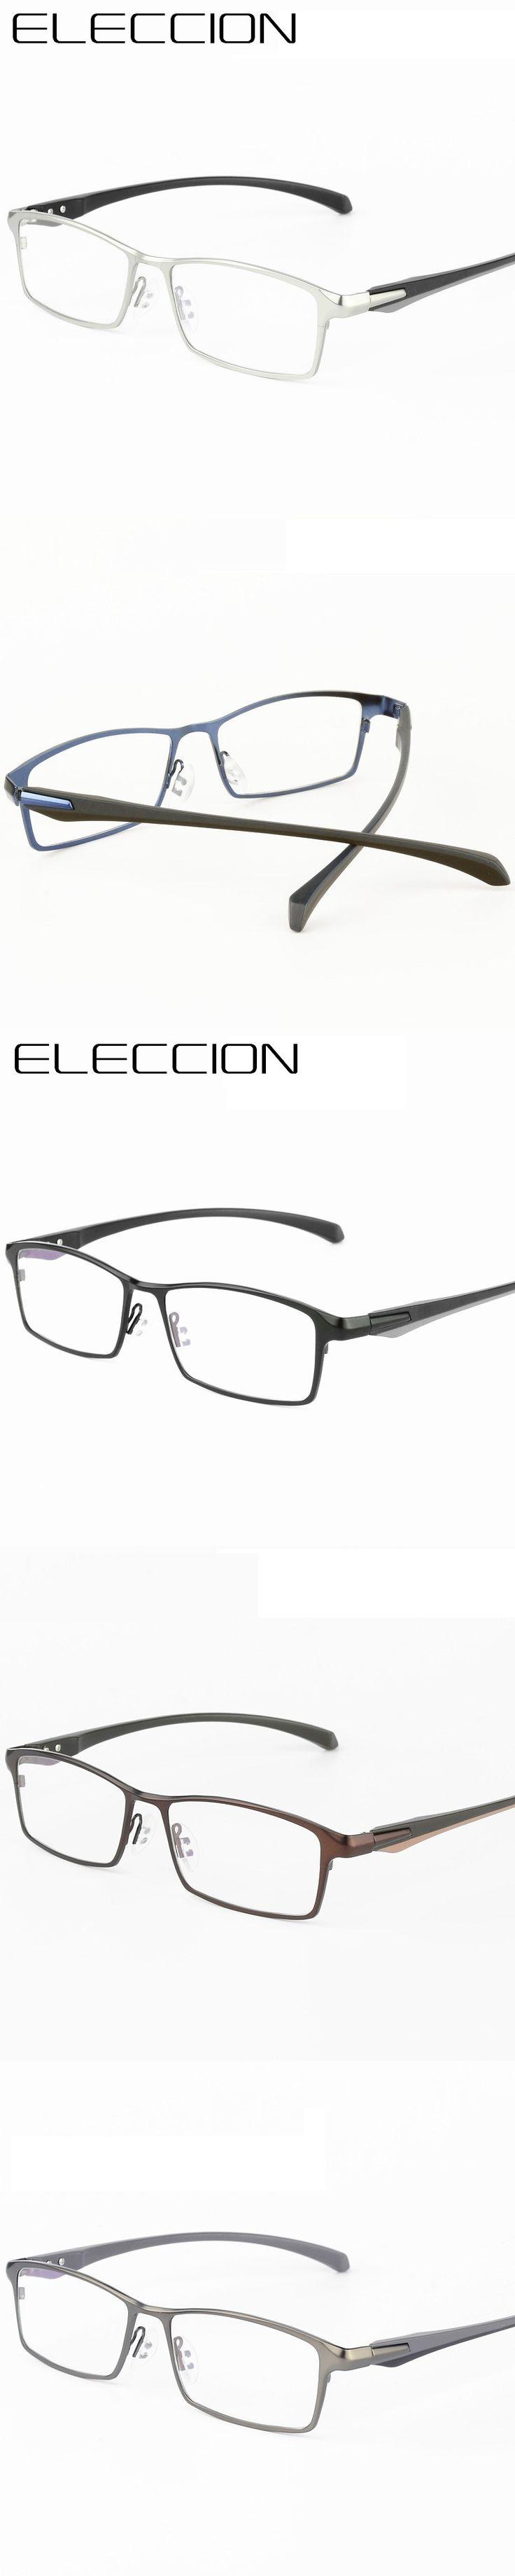 ELECCION Brand High End Business Classic Series Optics Eyeglasses Frames Men Square Full Frame Myopia Prescription Glasses Frame